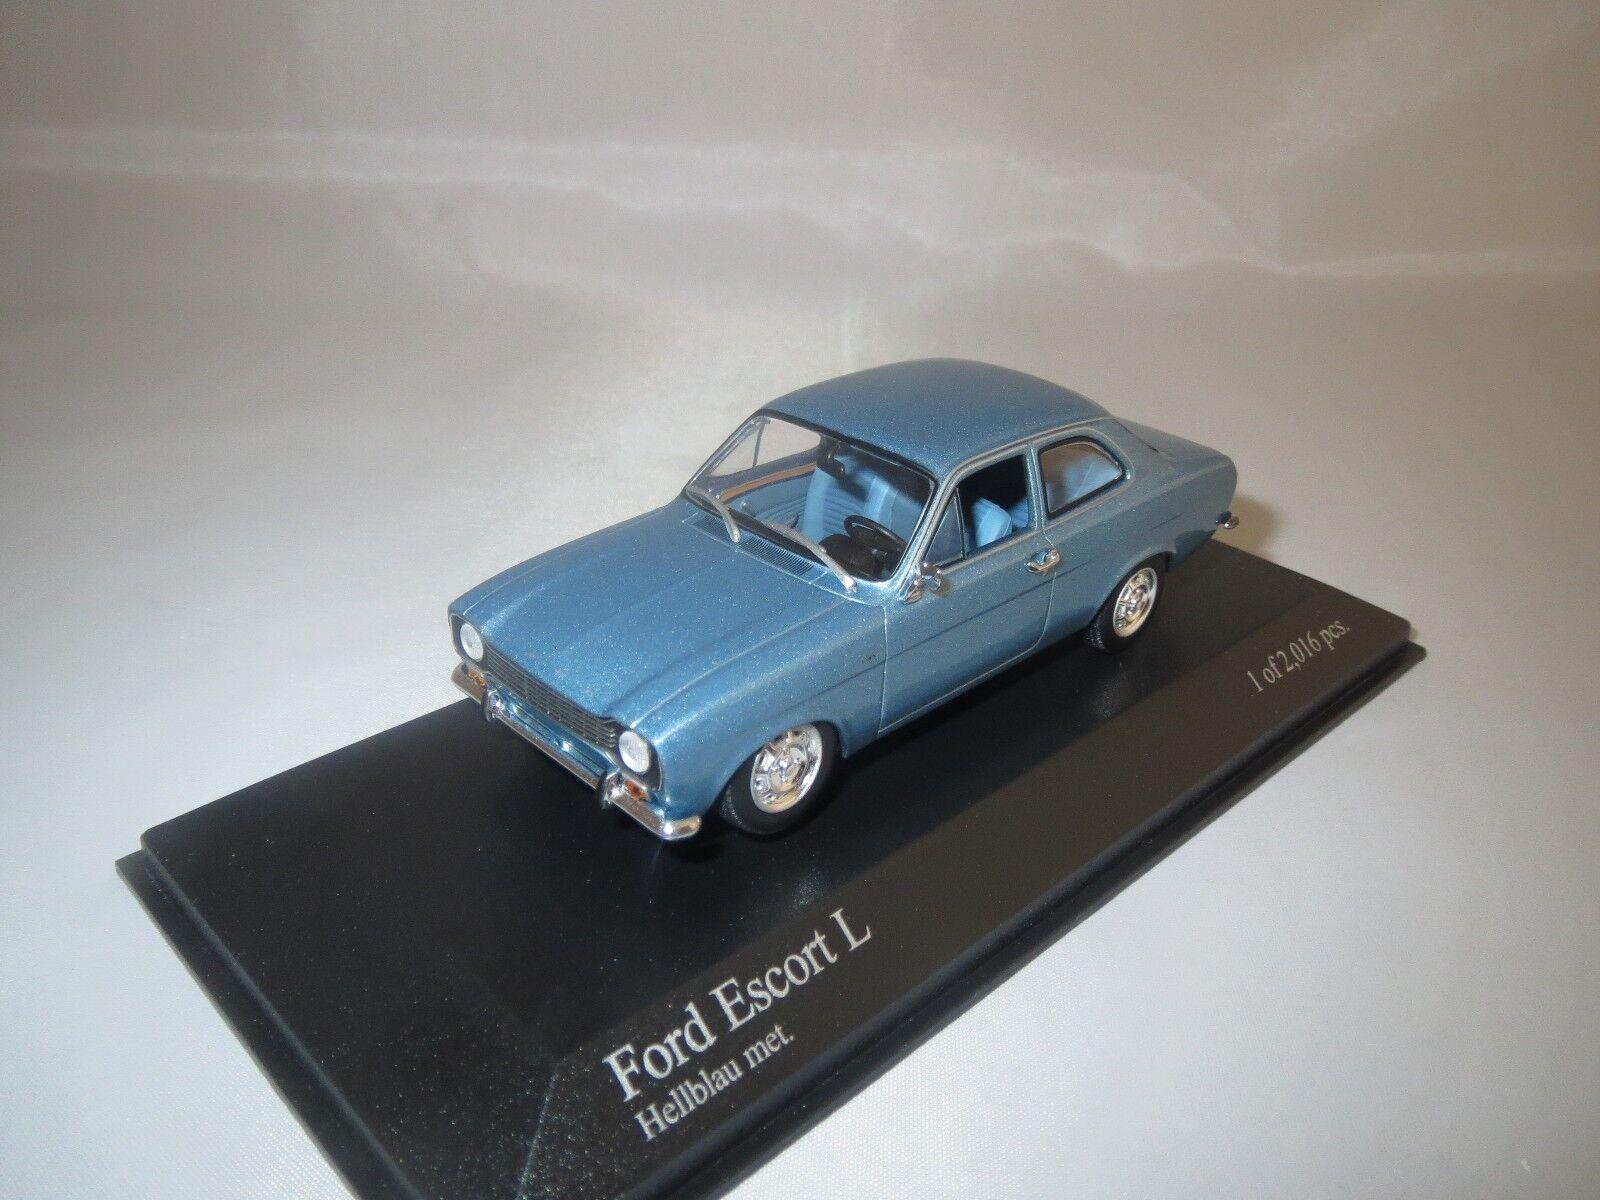 Minichamps  Ford  Escort L   1971   (light bluee met.)  1 43  OVP